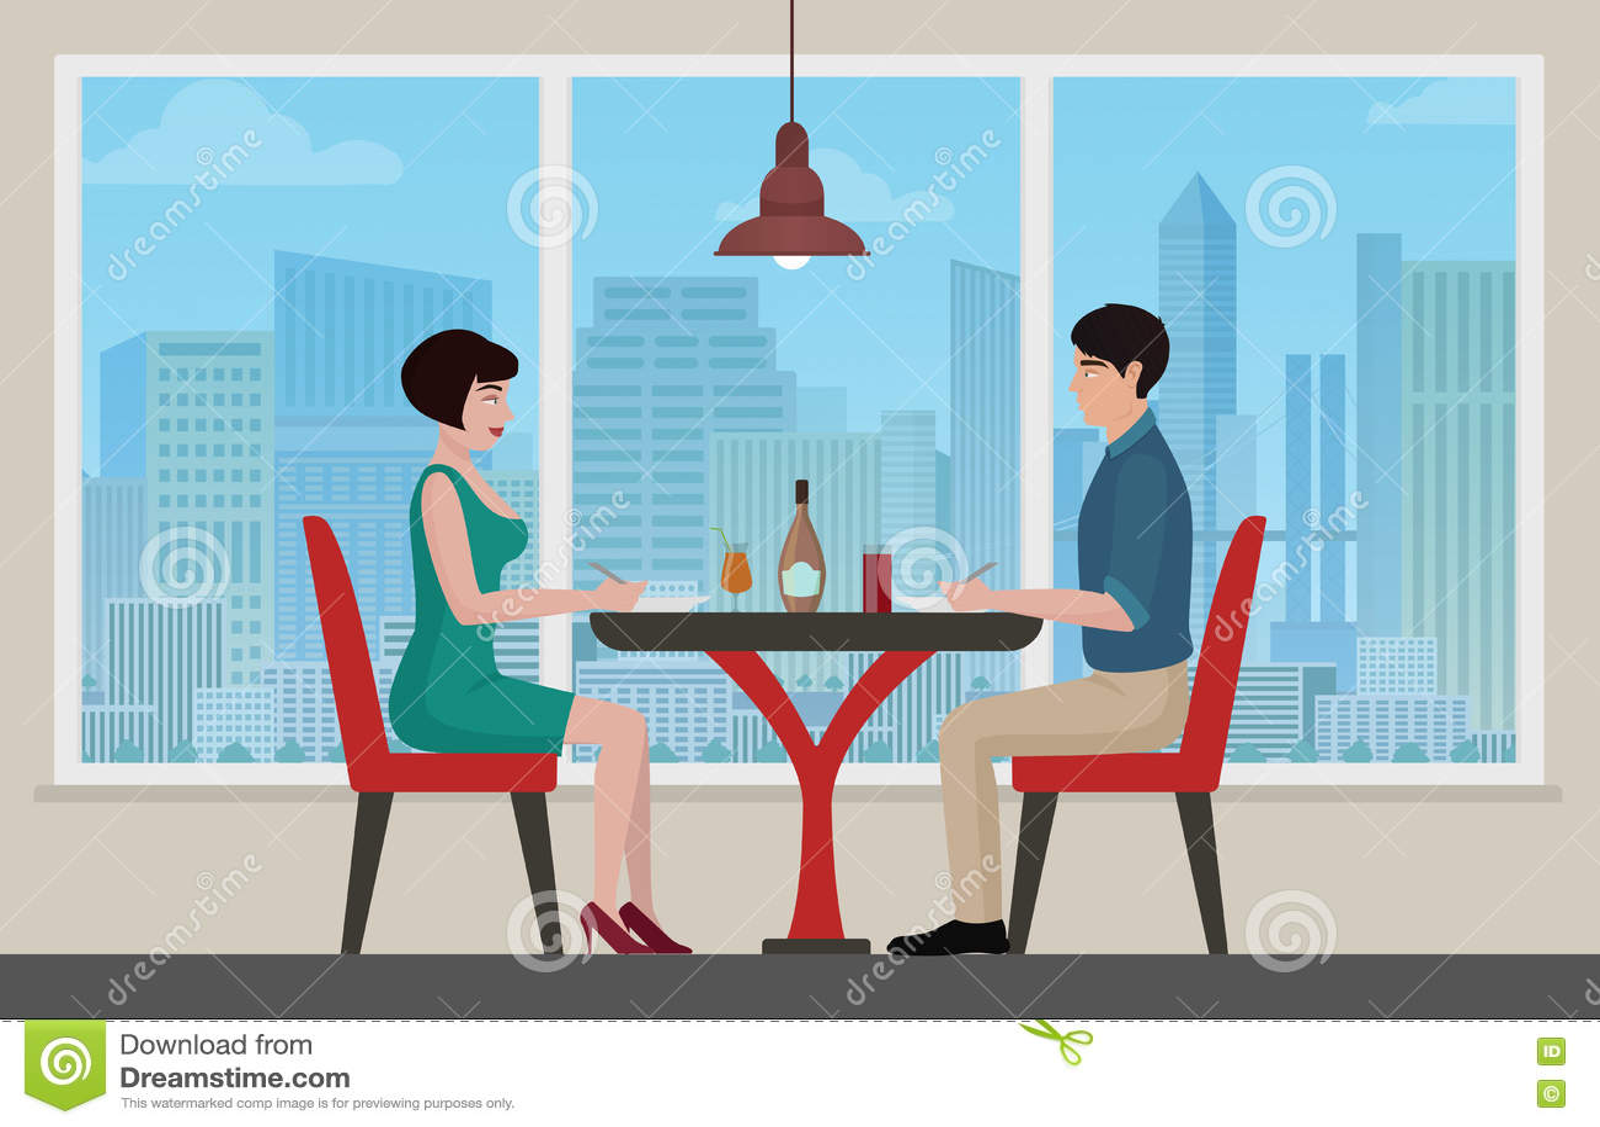 Cartoon restaurant free vector graphic download - Royalty Free Vector Cafe Cartoon